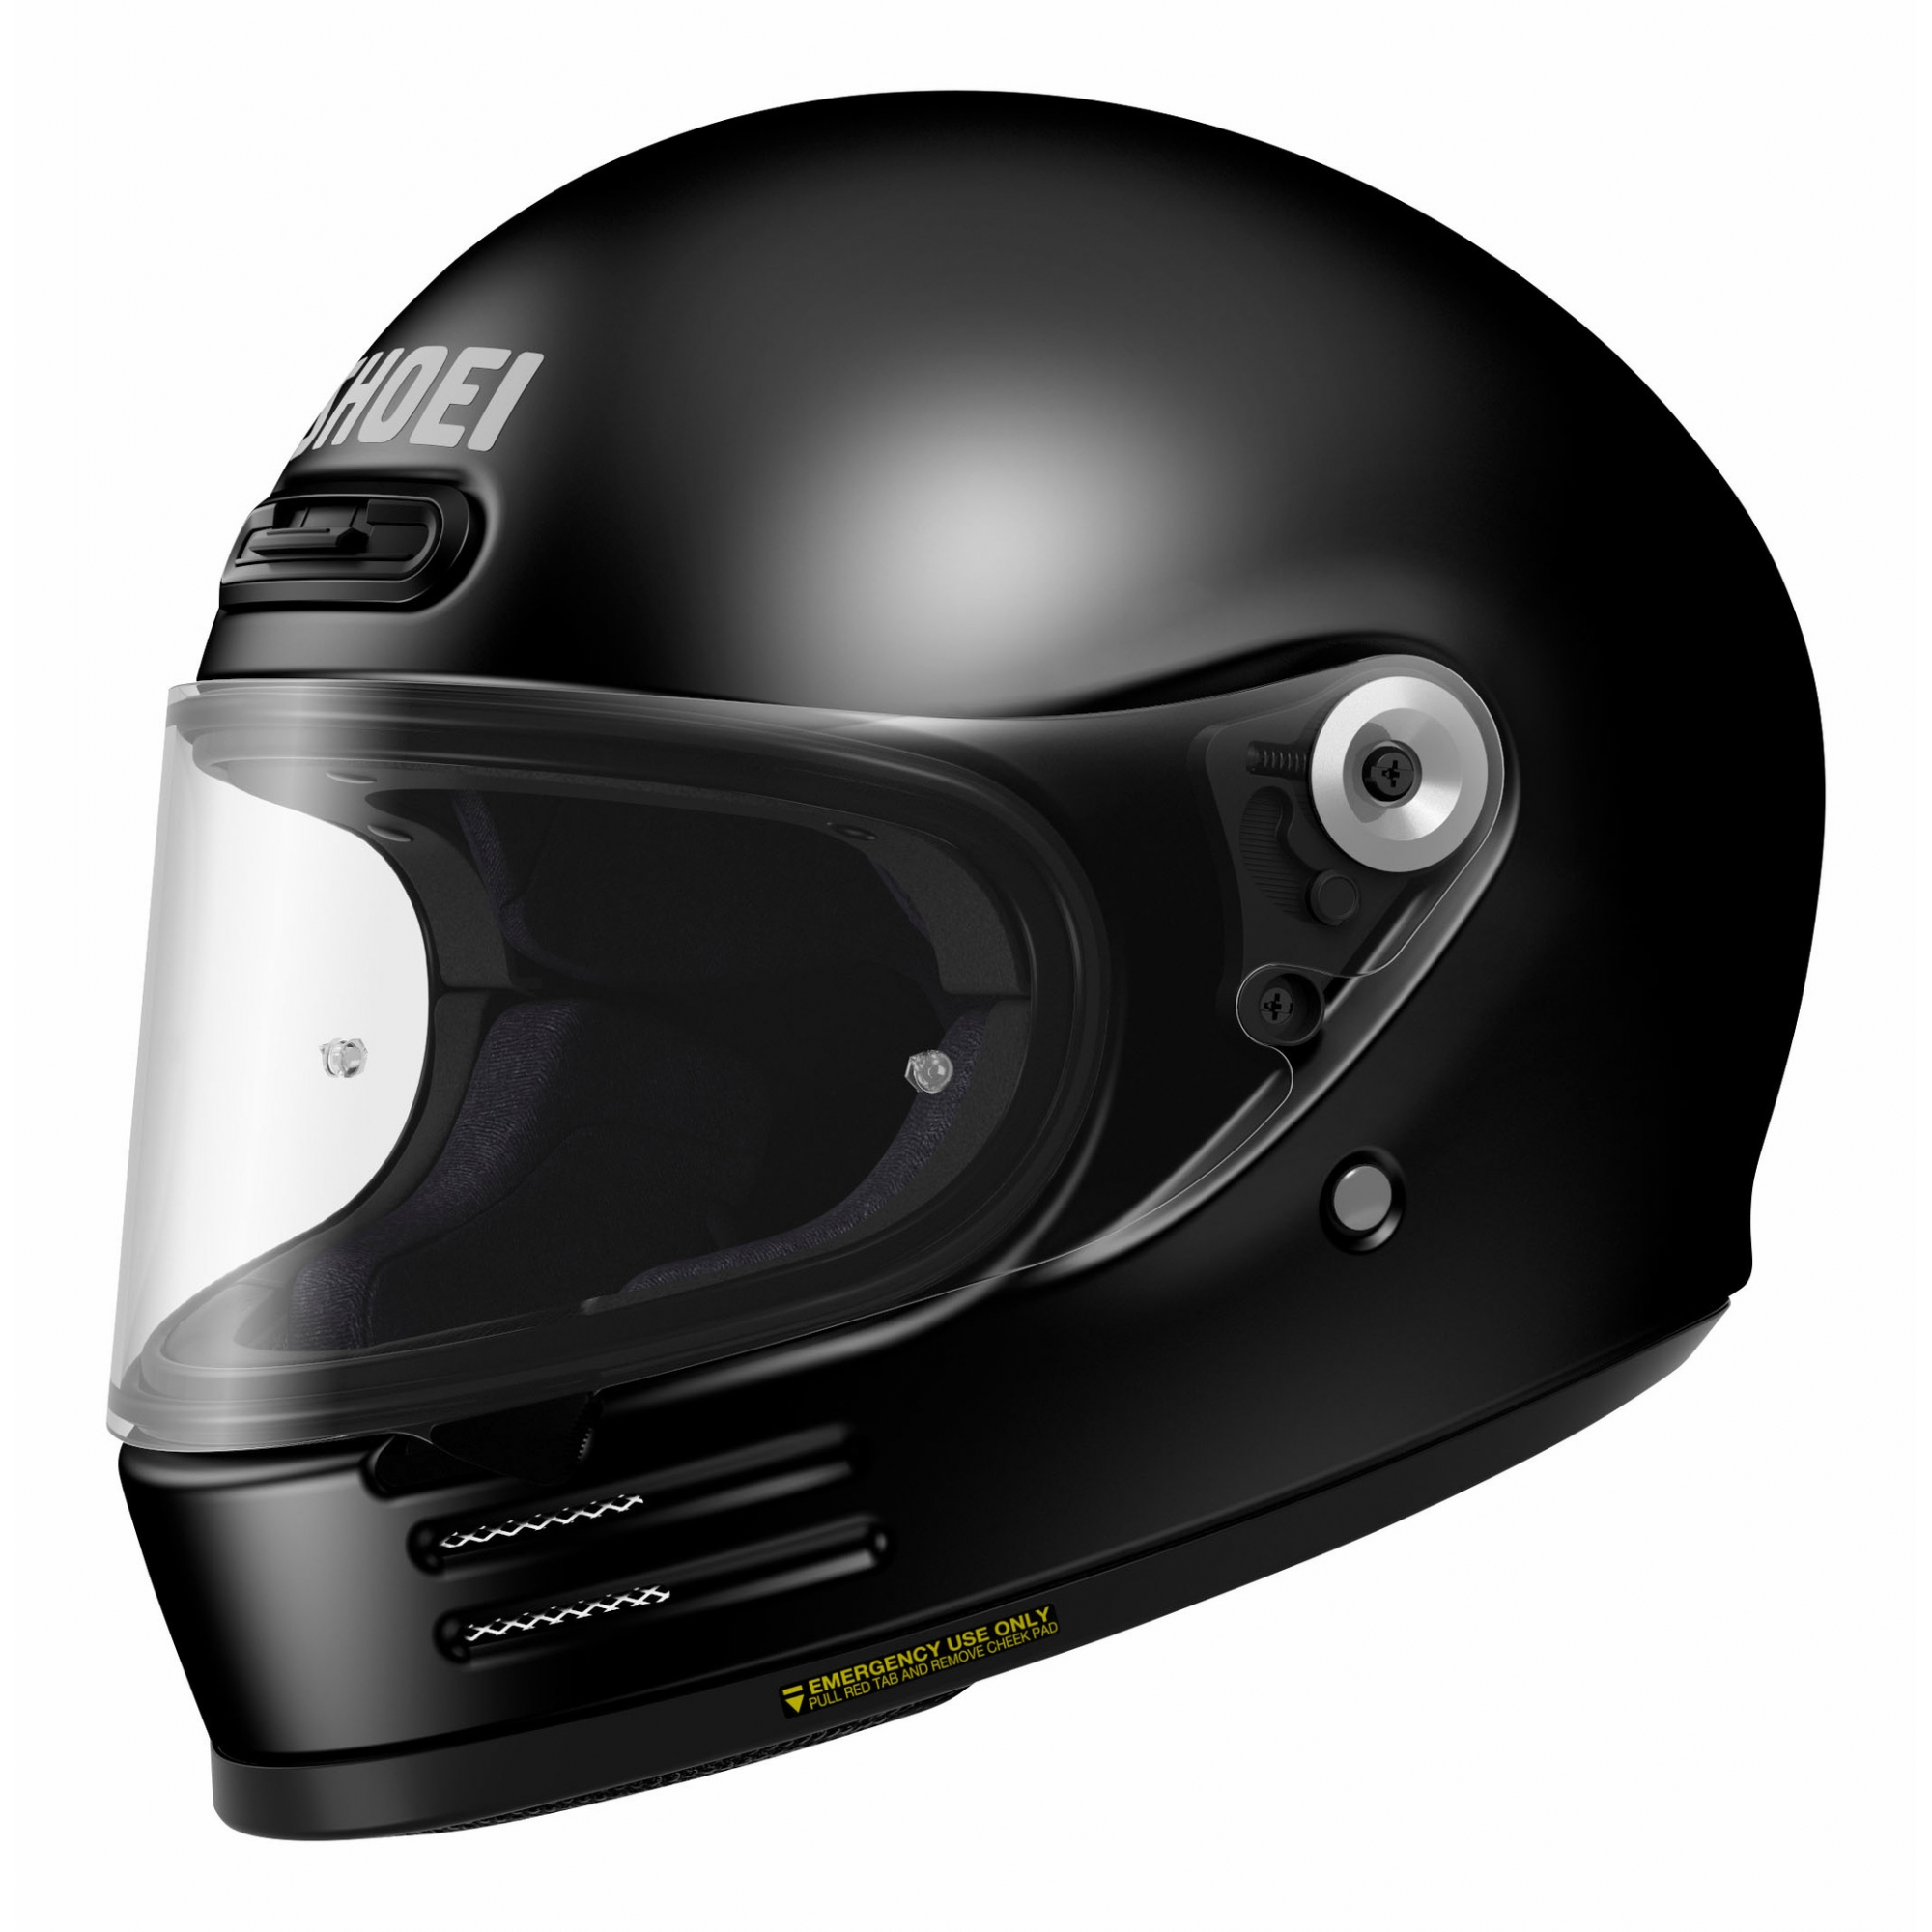 Capacete Shoei Glamster - Preto Fosco - LANÇAMENTO  - Planet Bike Shop Moto Acessórios